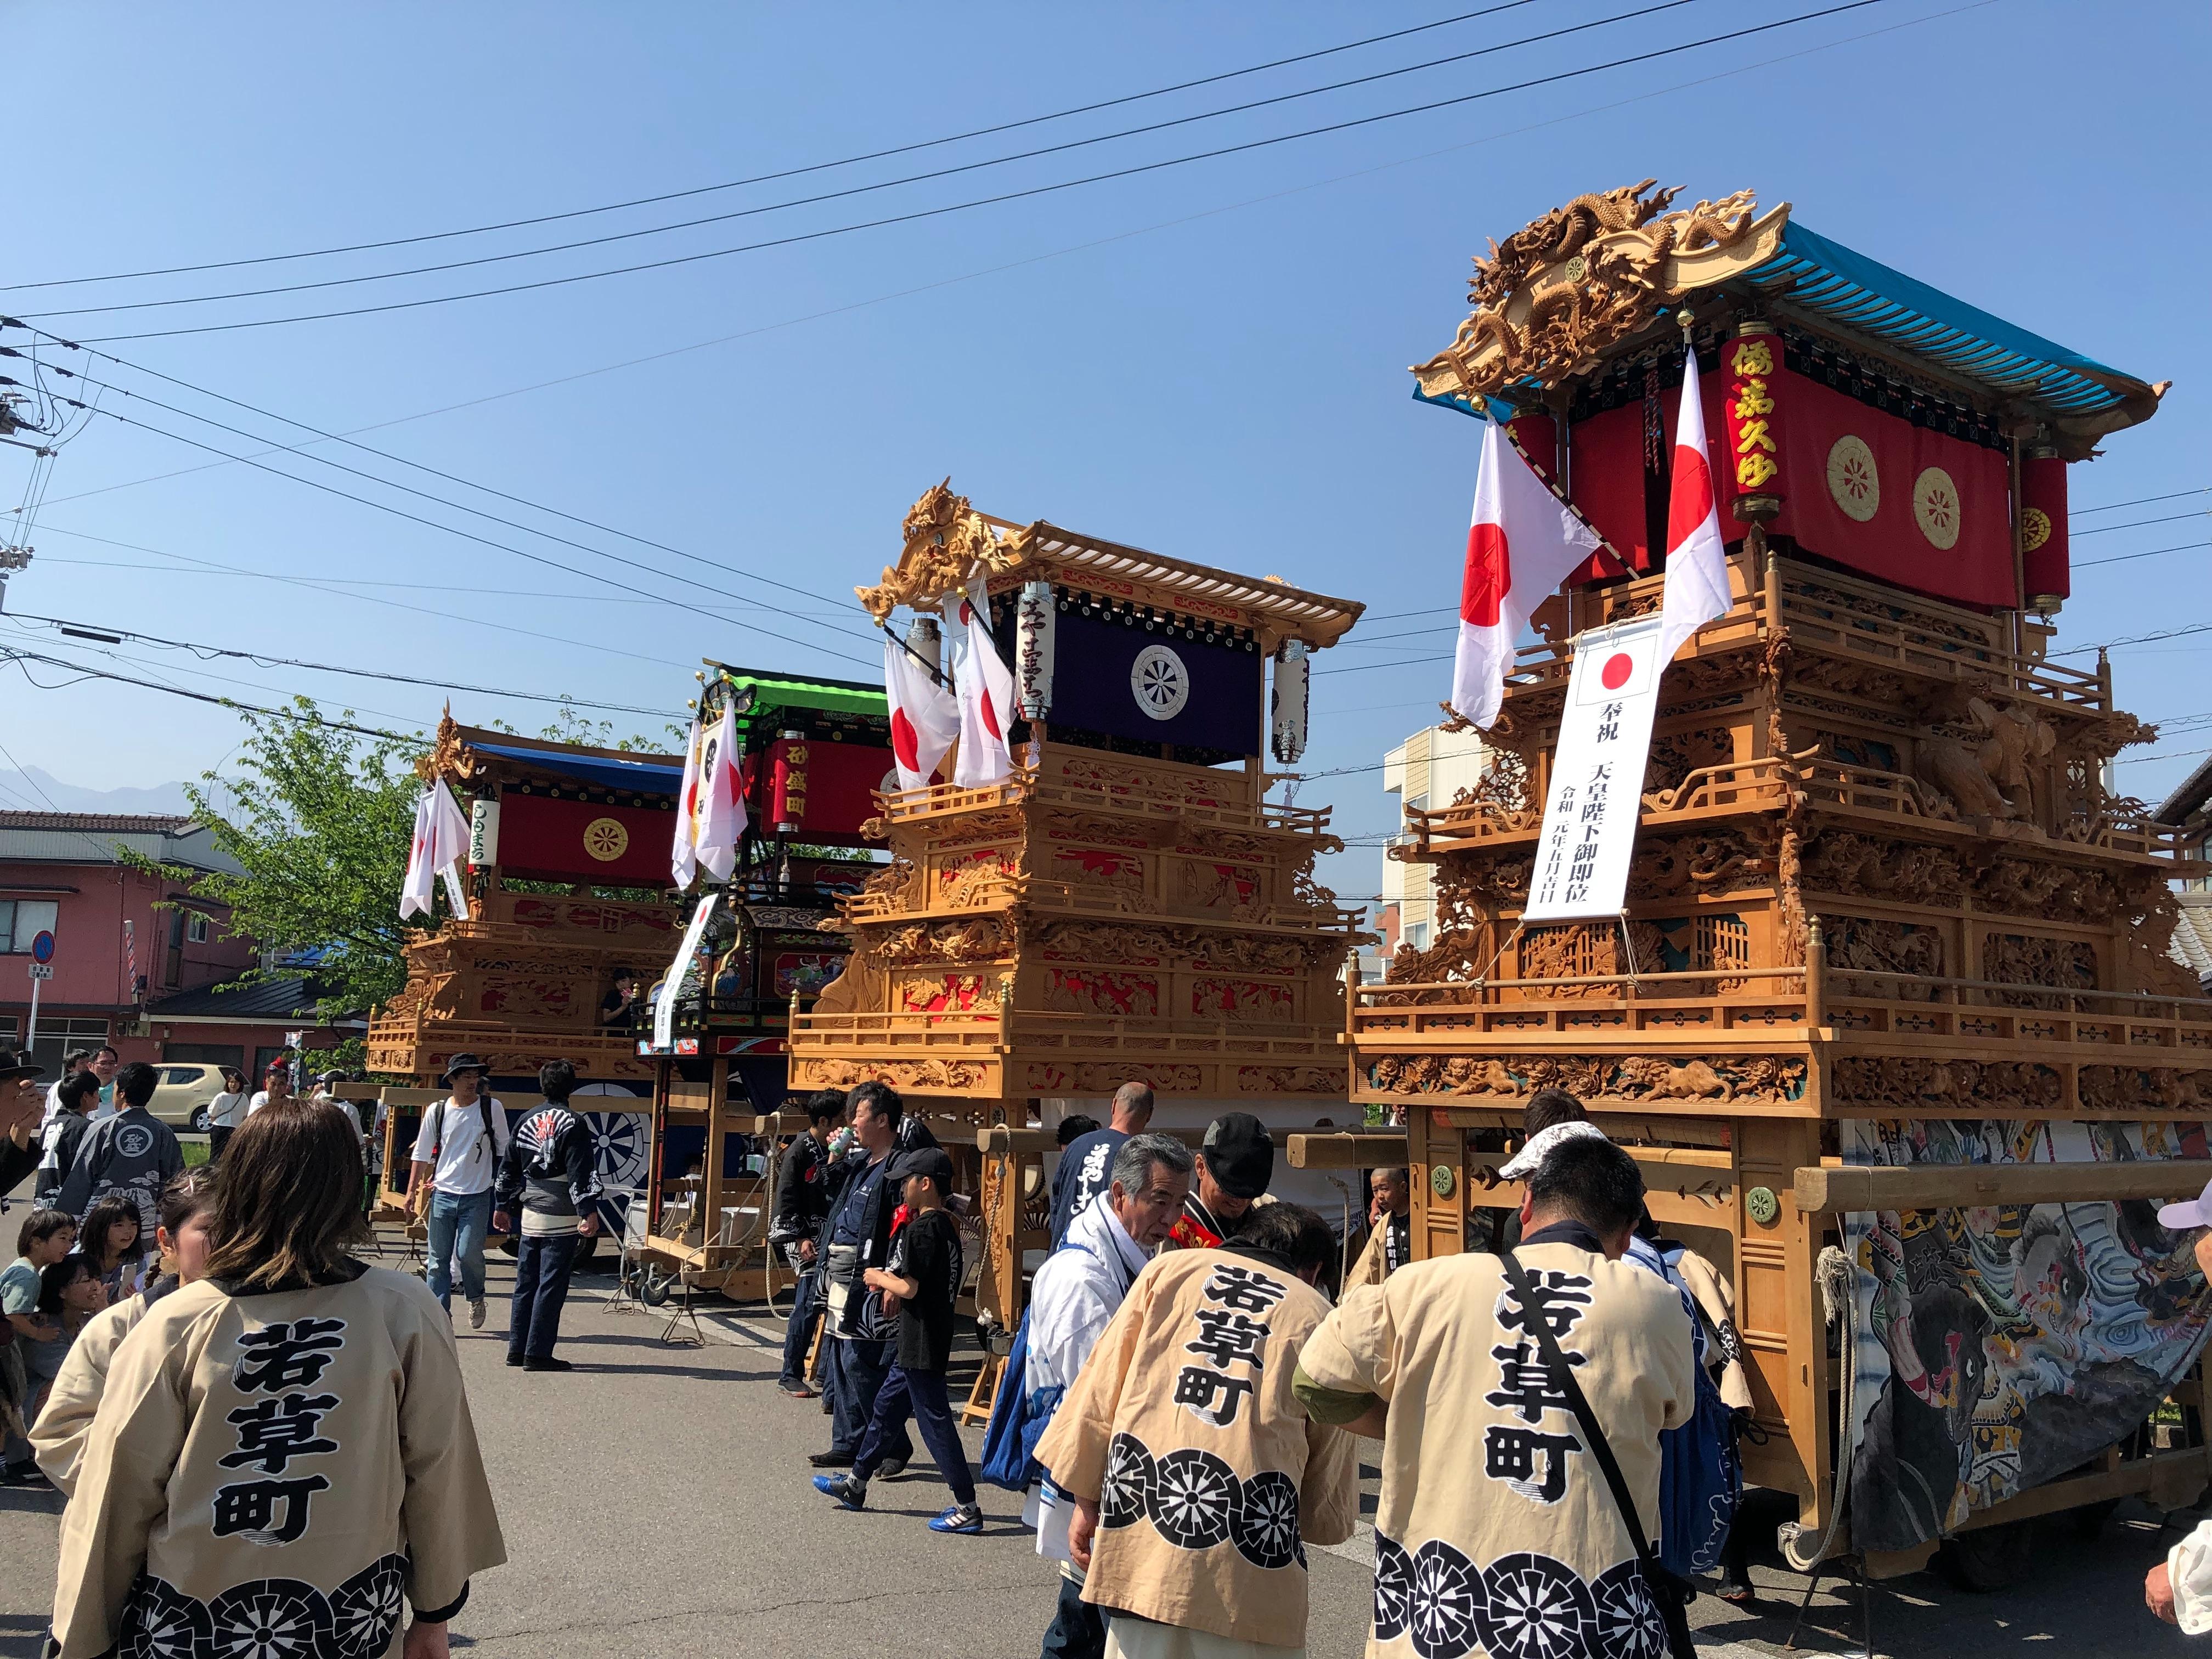 f:id:masanori-kato1972:20190504182513j:image